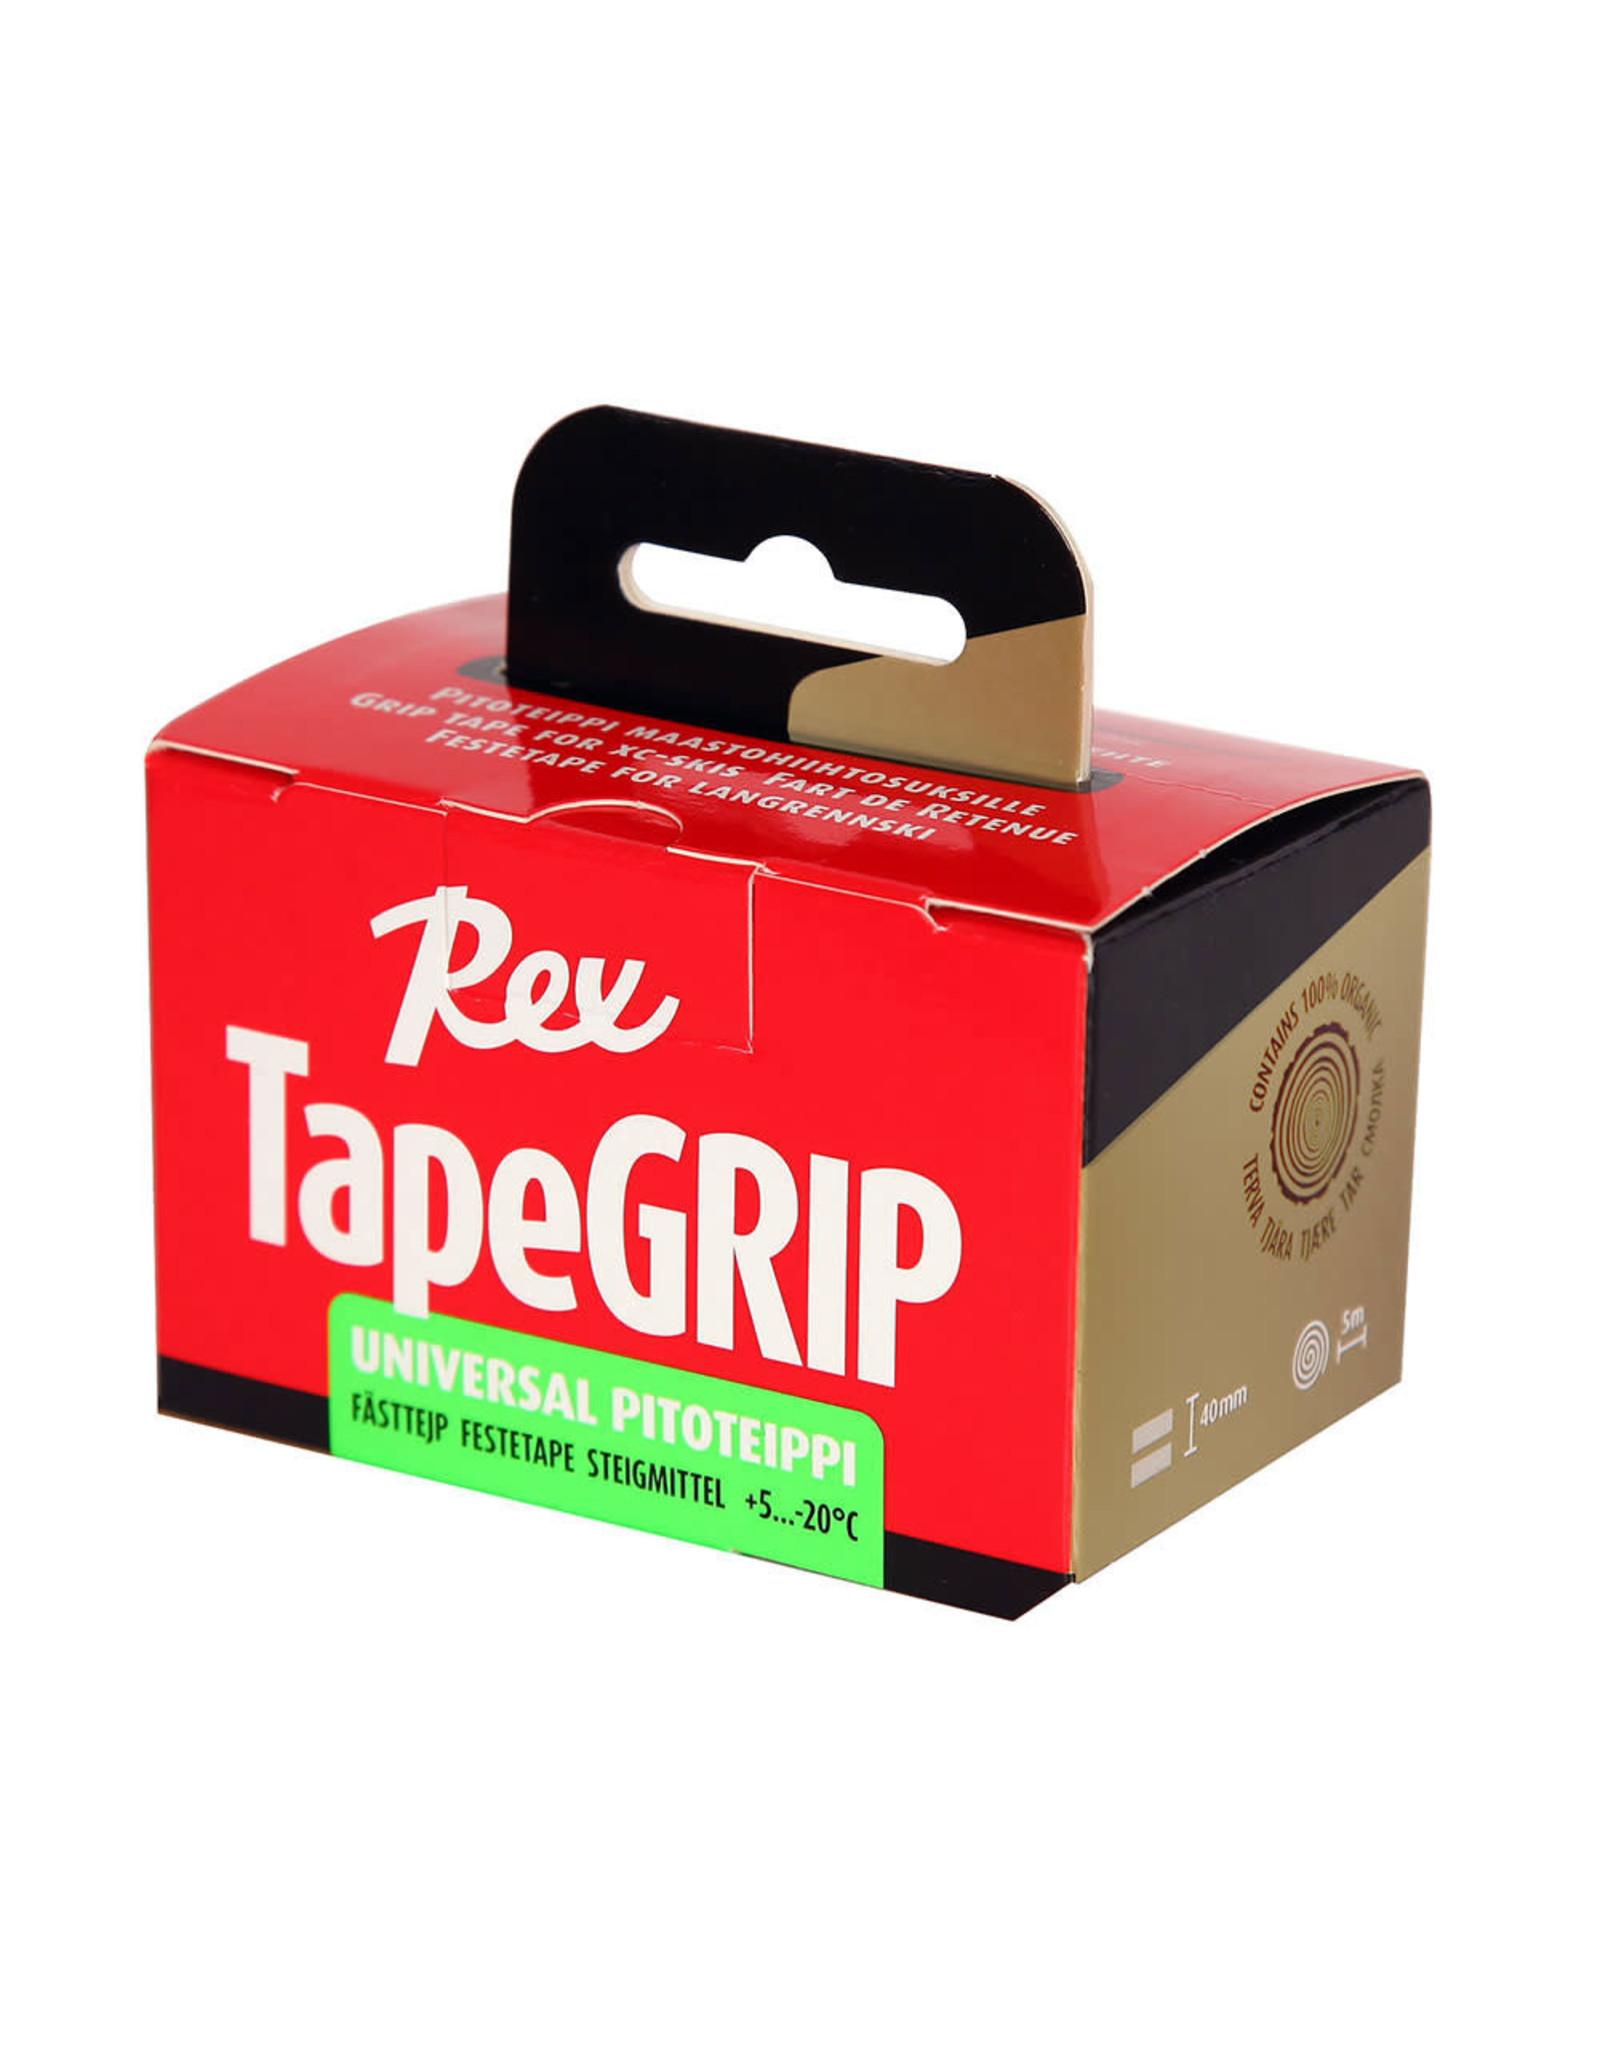 Rex Rex Kick TapeGrip Universal Gold